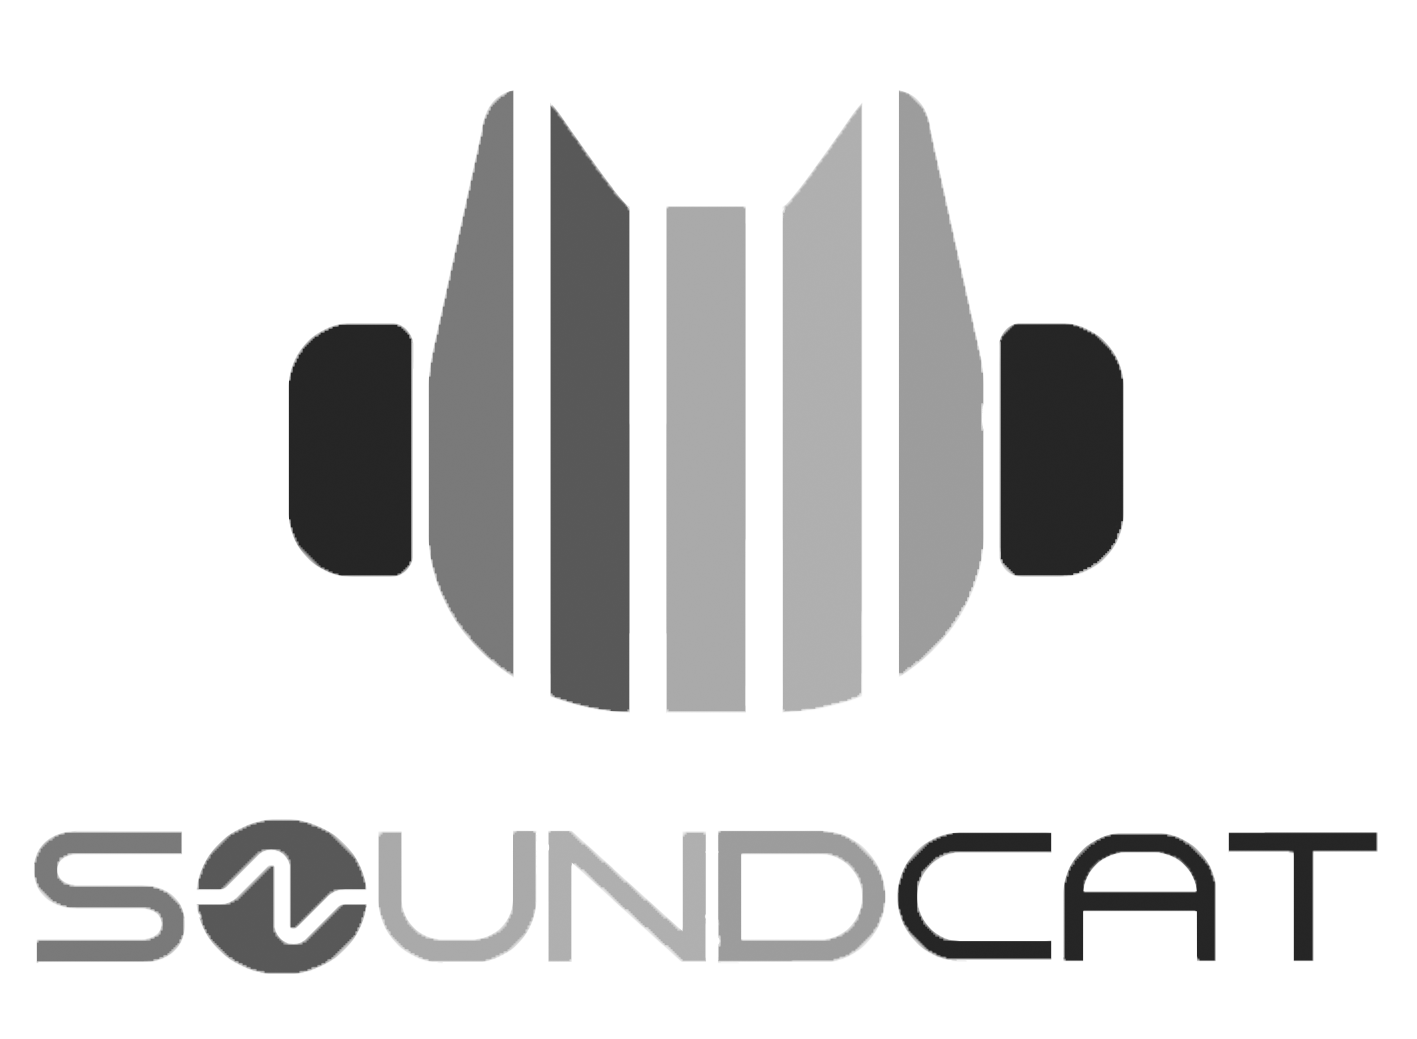 soundcatLOGO BW